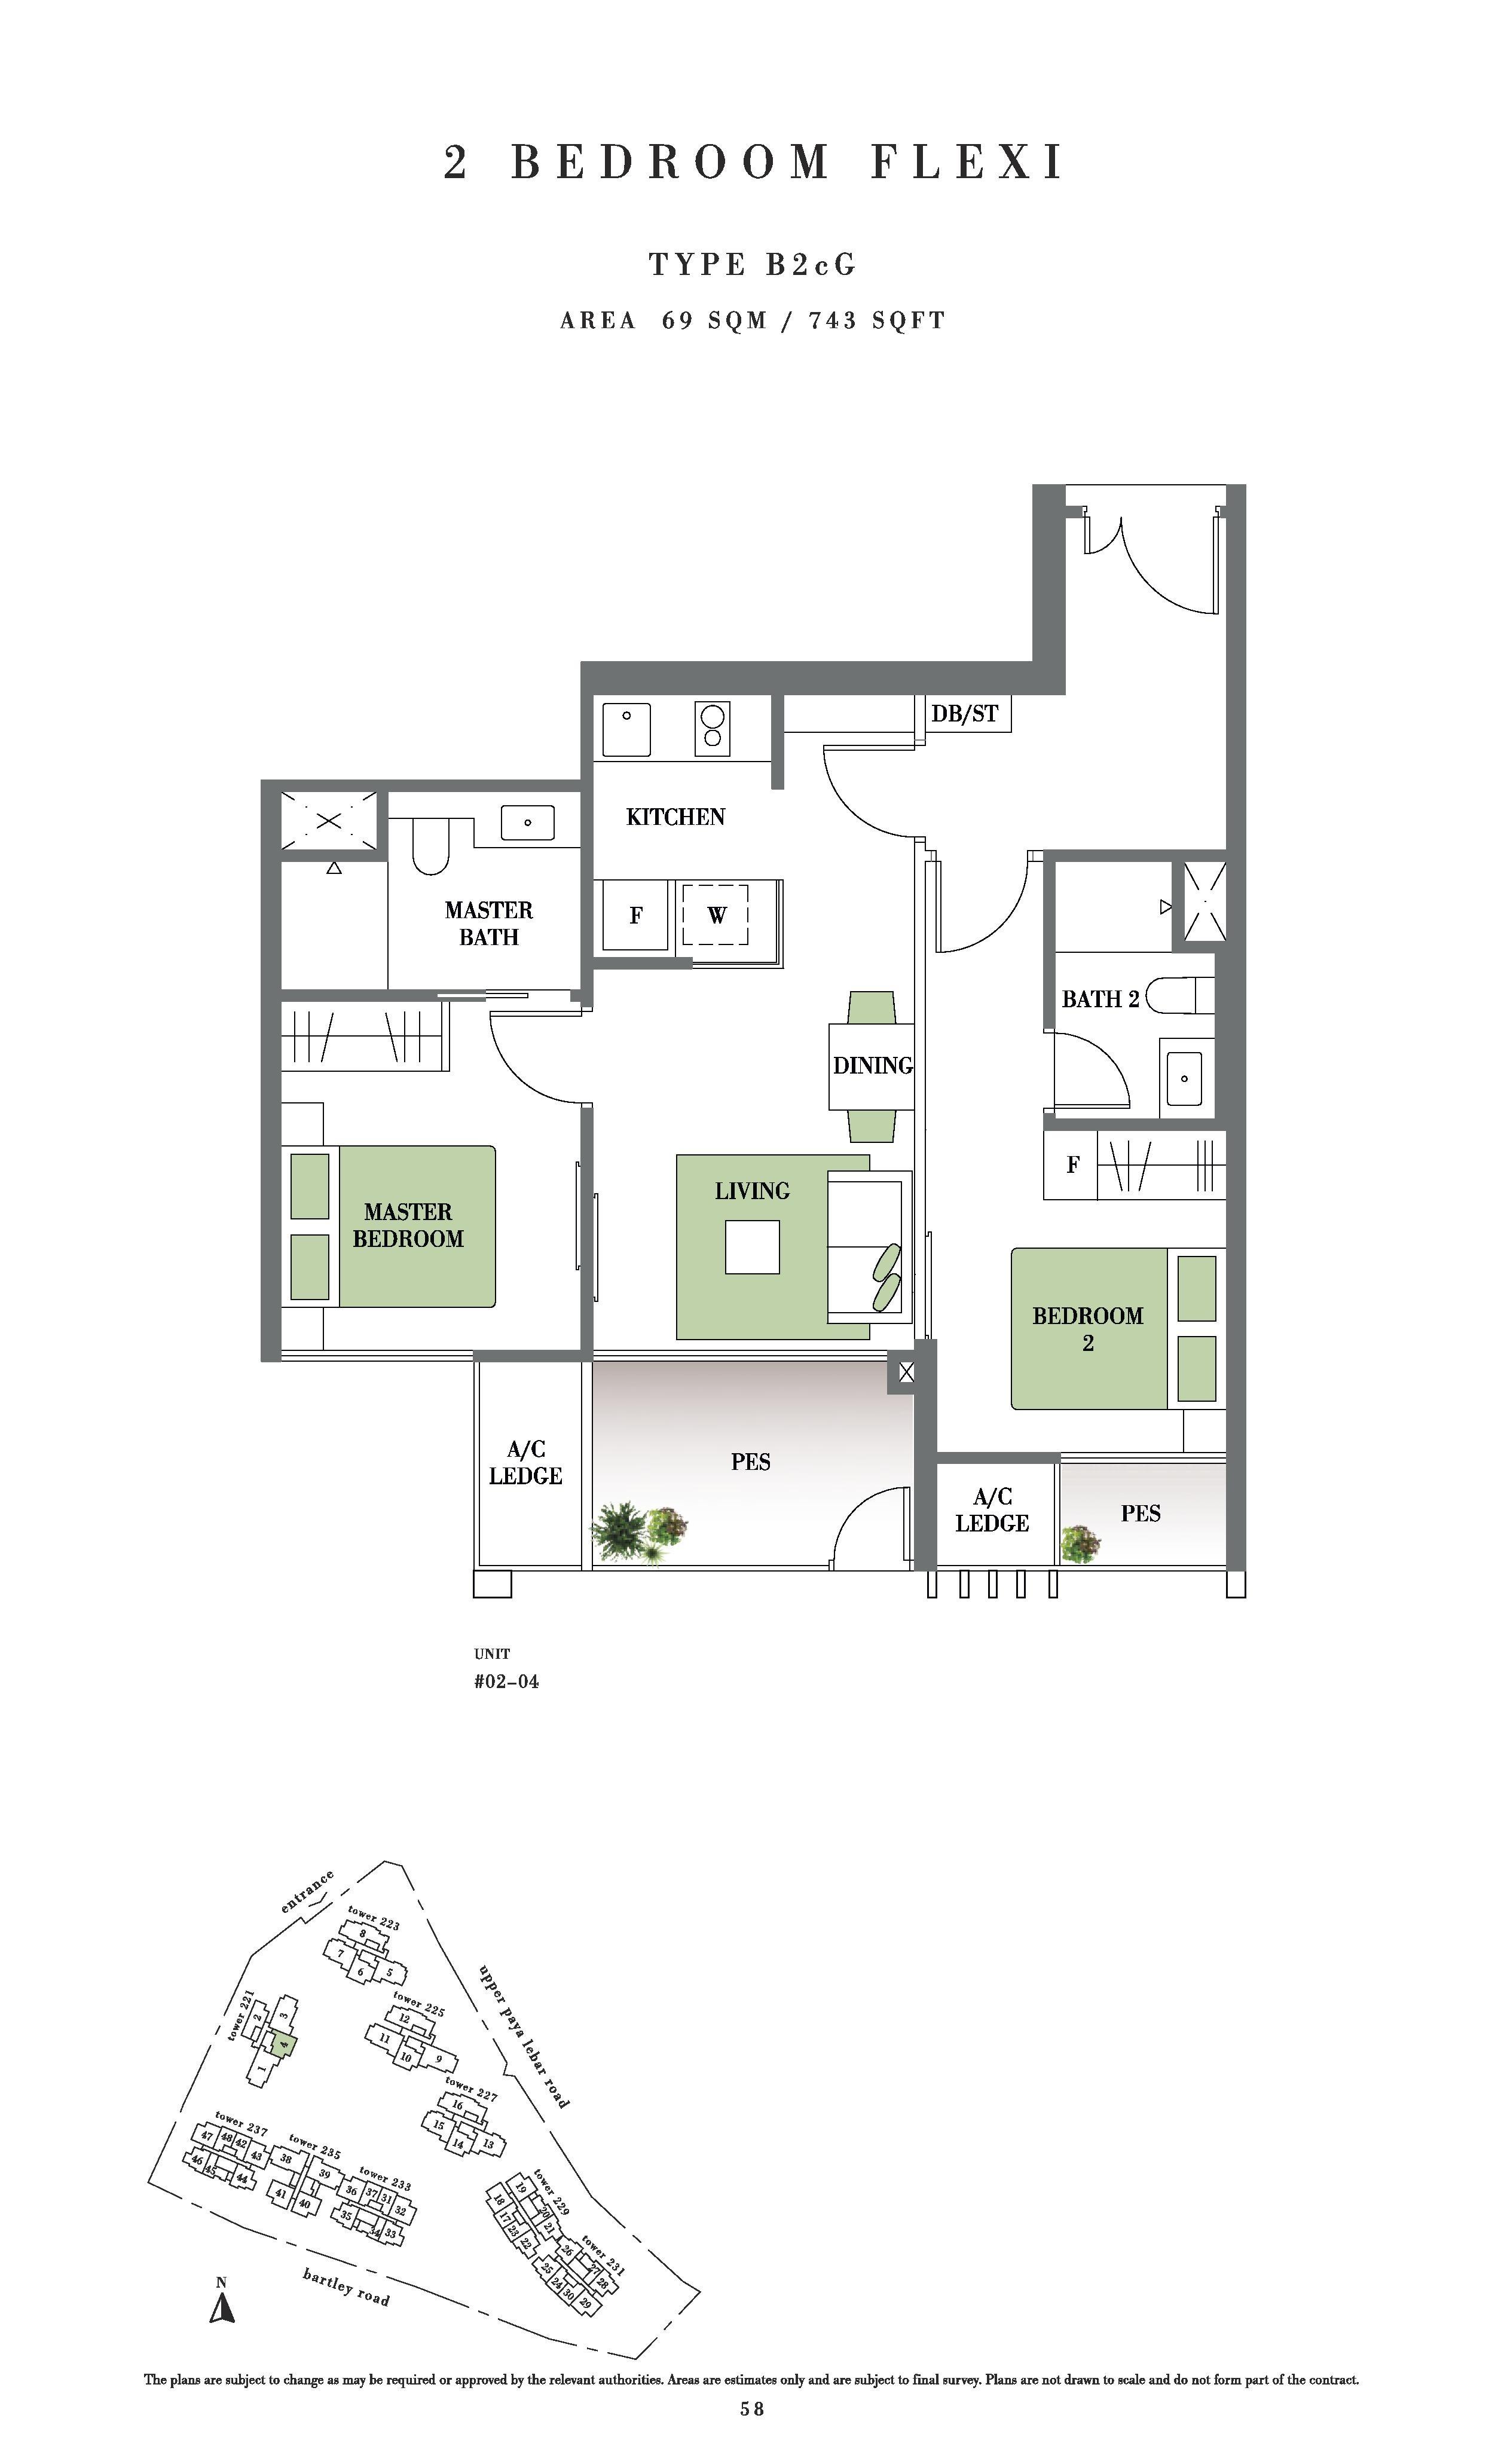 Botanique @ Bartley 2 Bedroom Flexi PES Floor Plans Type B2cG